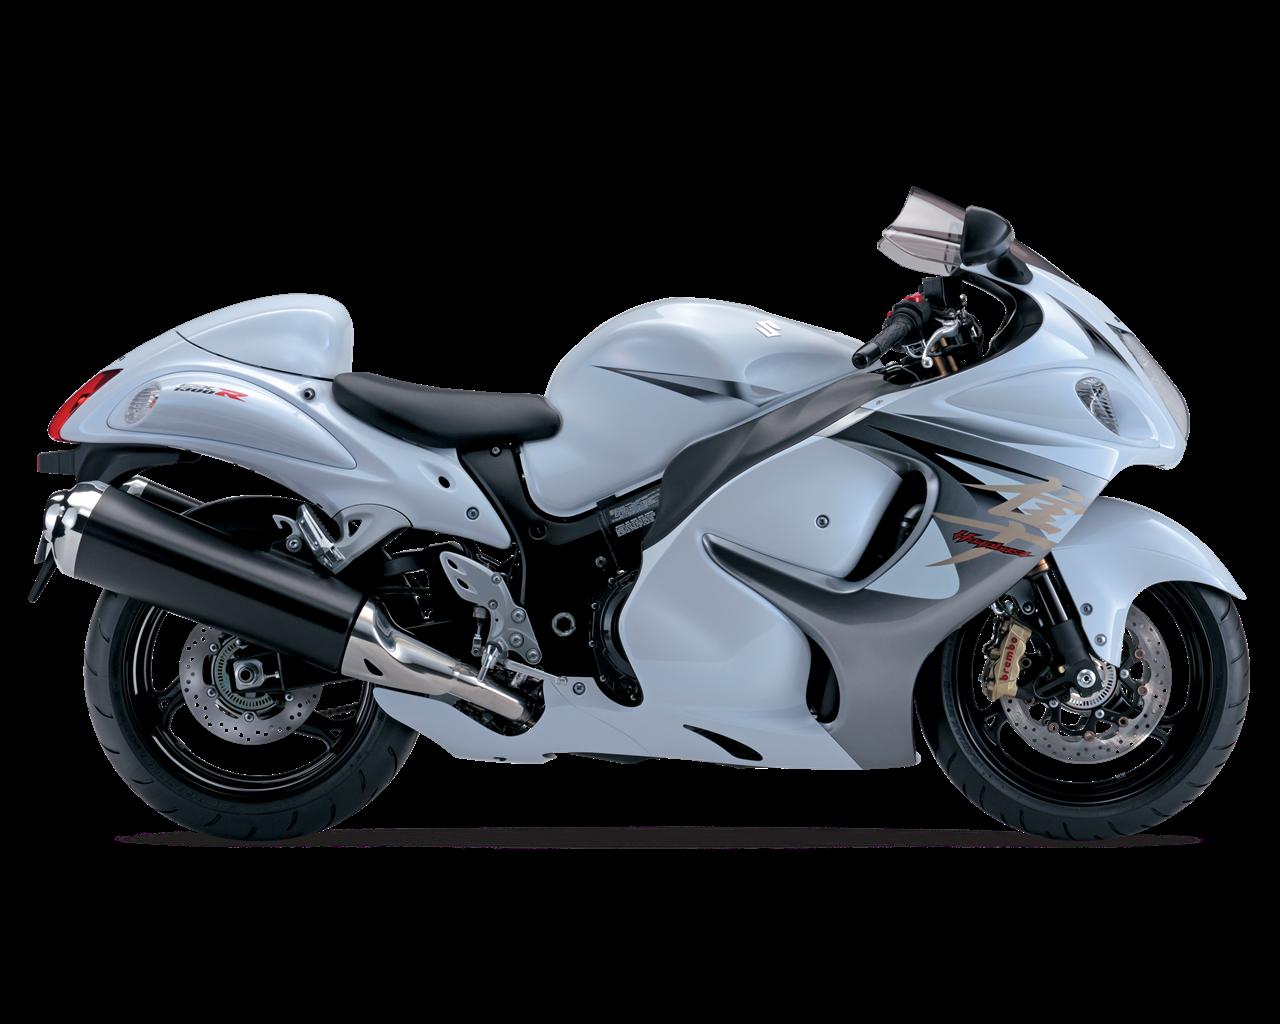 2013 Suzuki Hayabusa coming soon